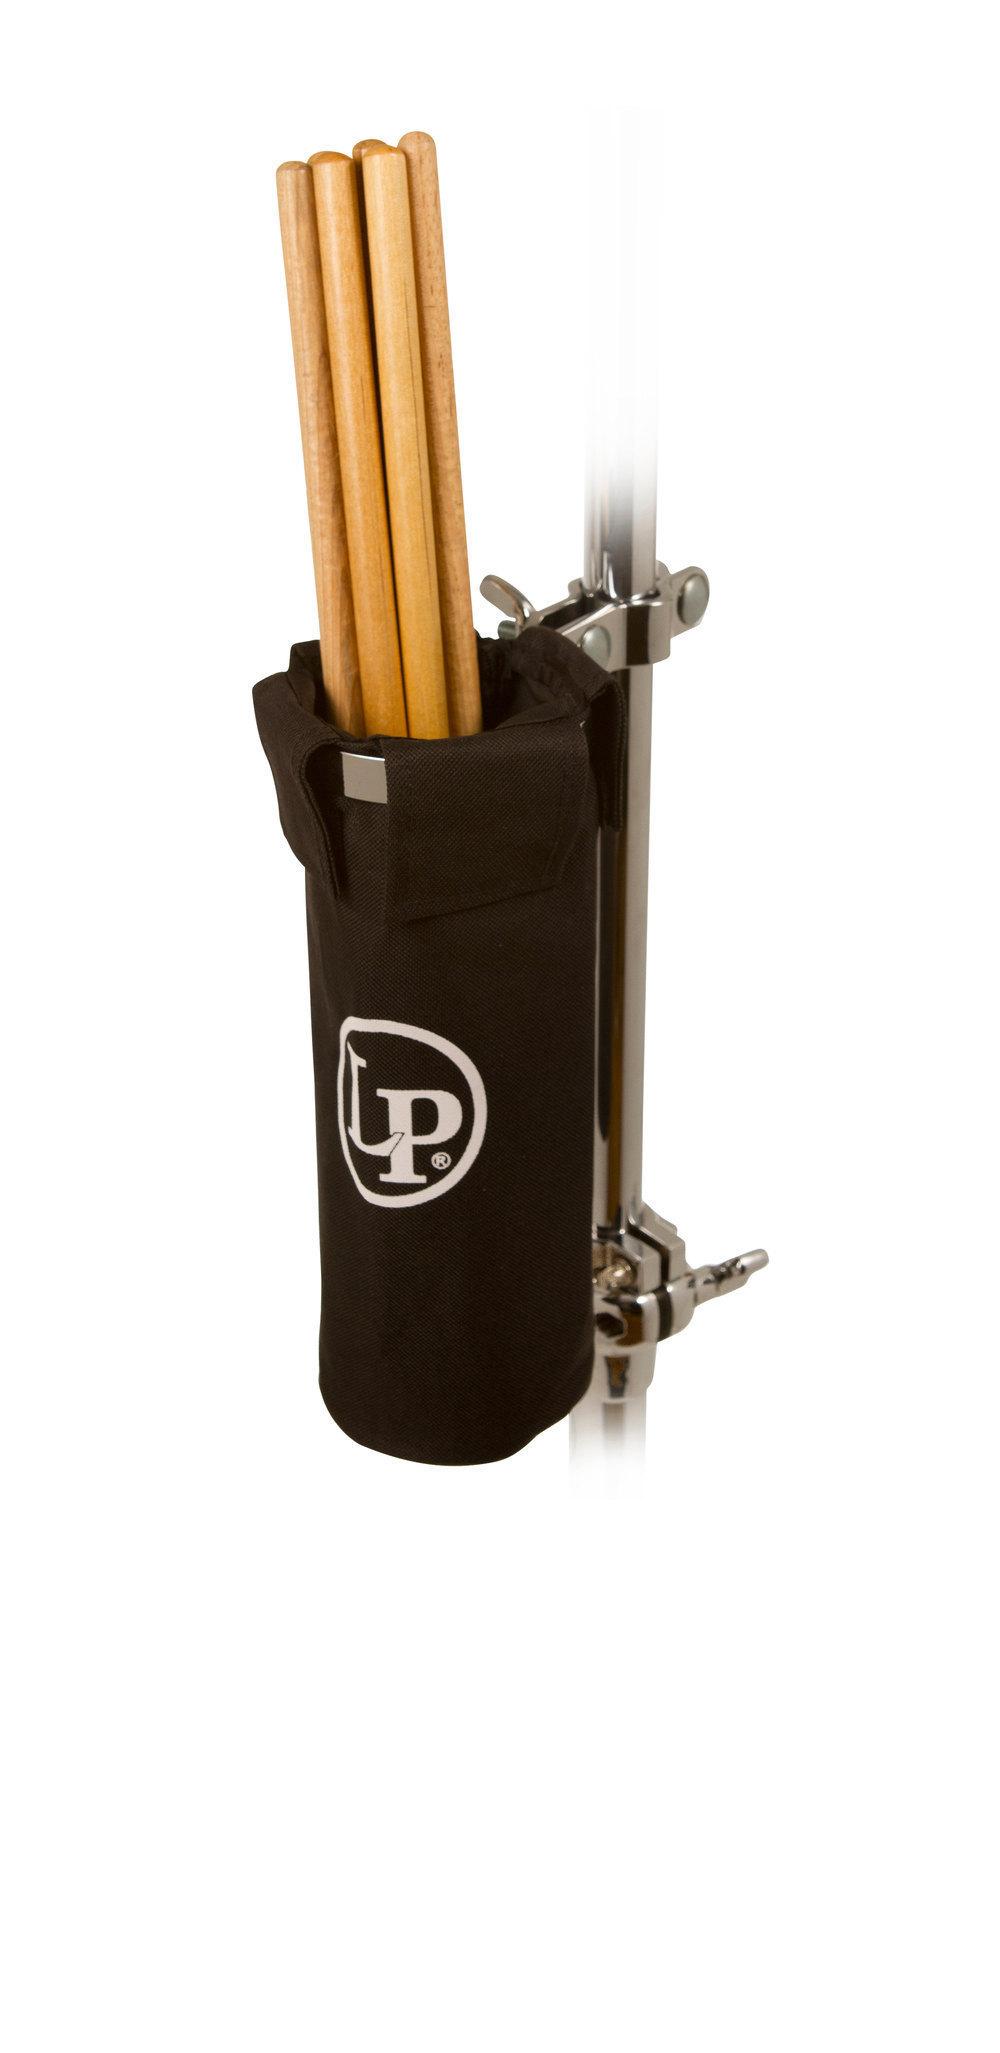 Image of   Stick holder